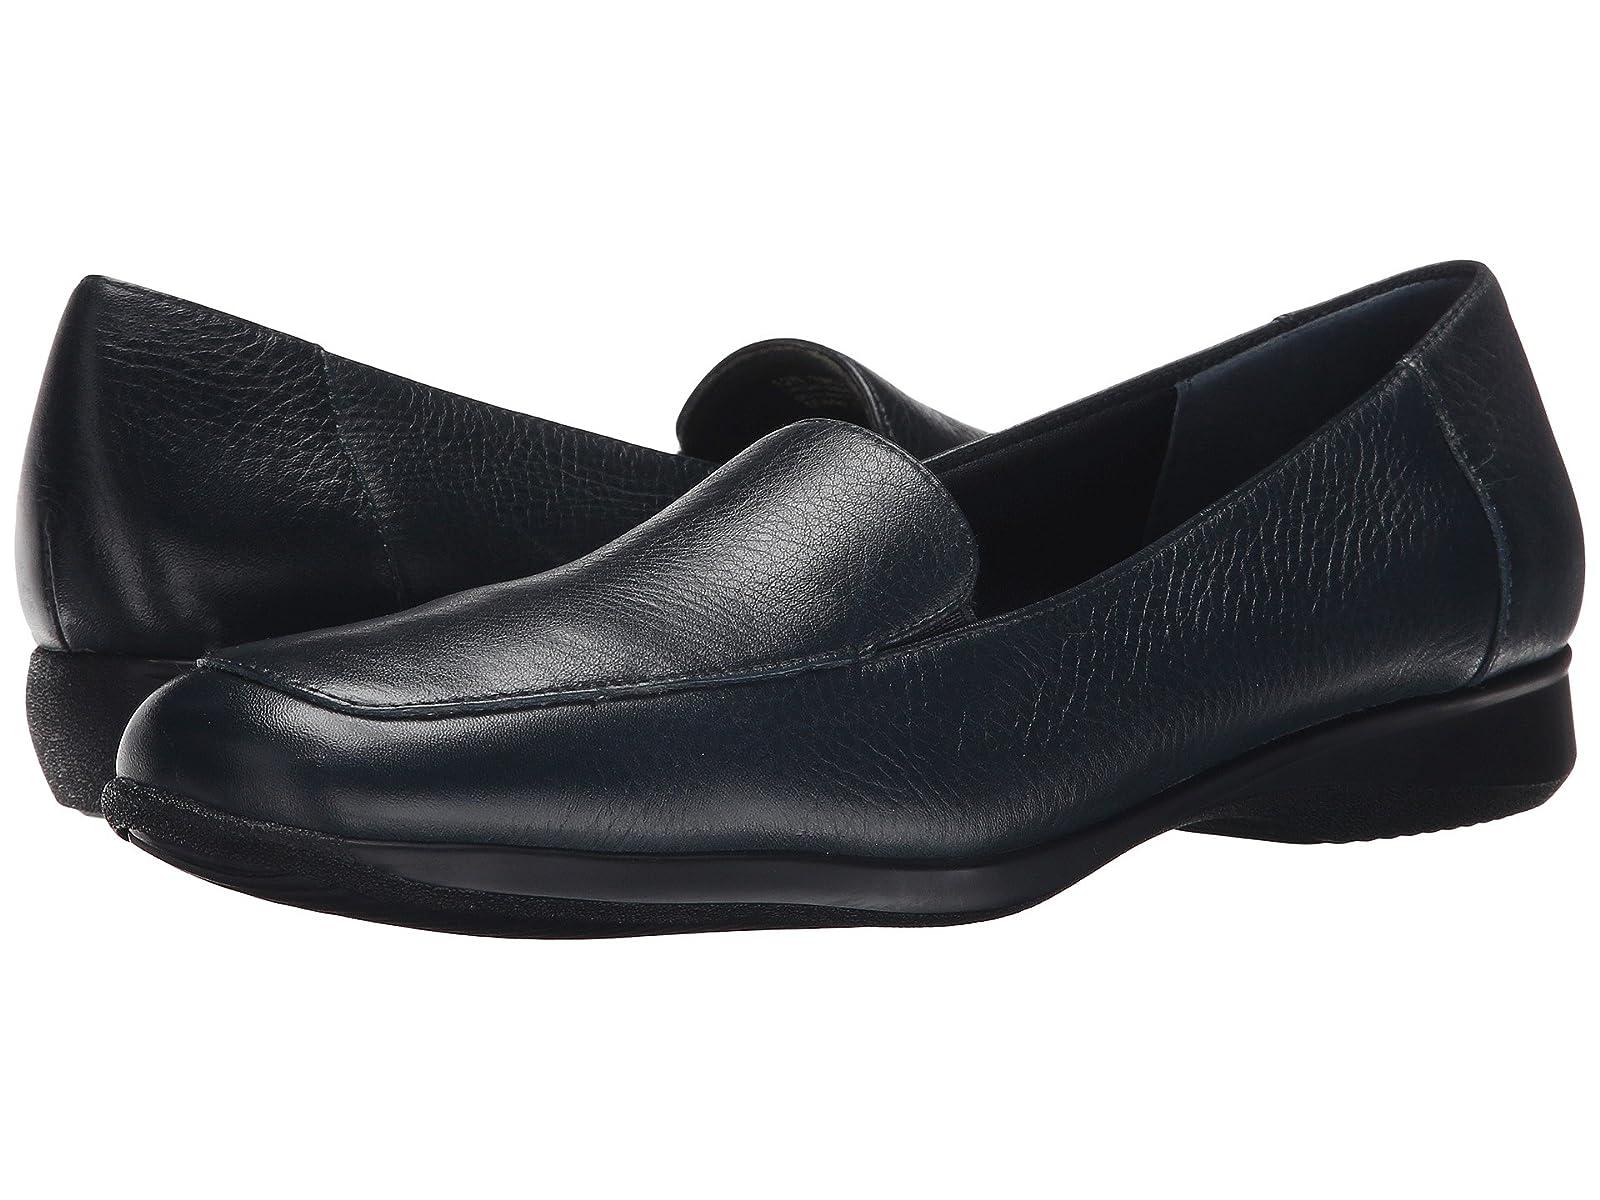 Trotters JennAtmospheric grades have affordable shoes